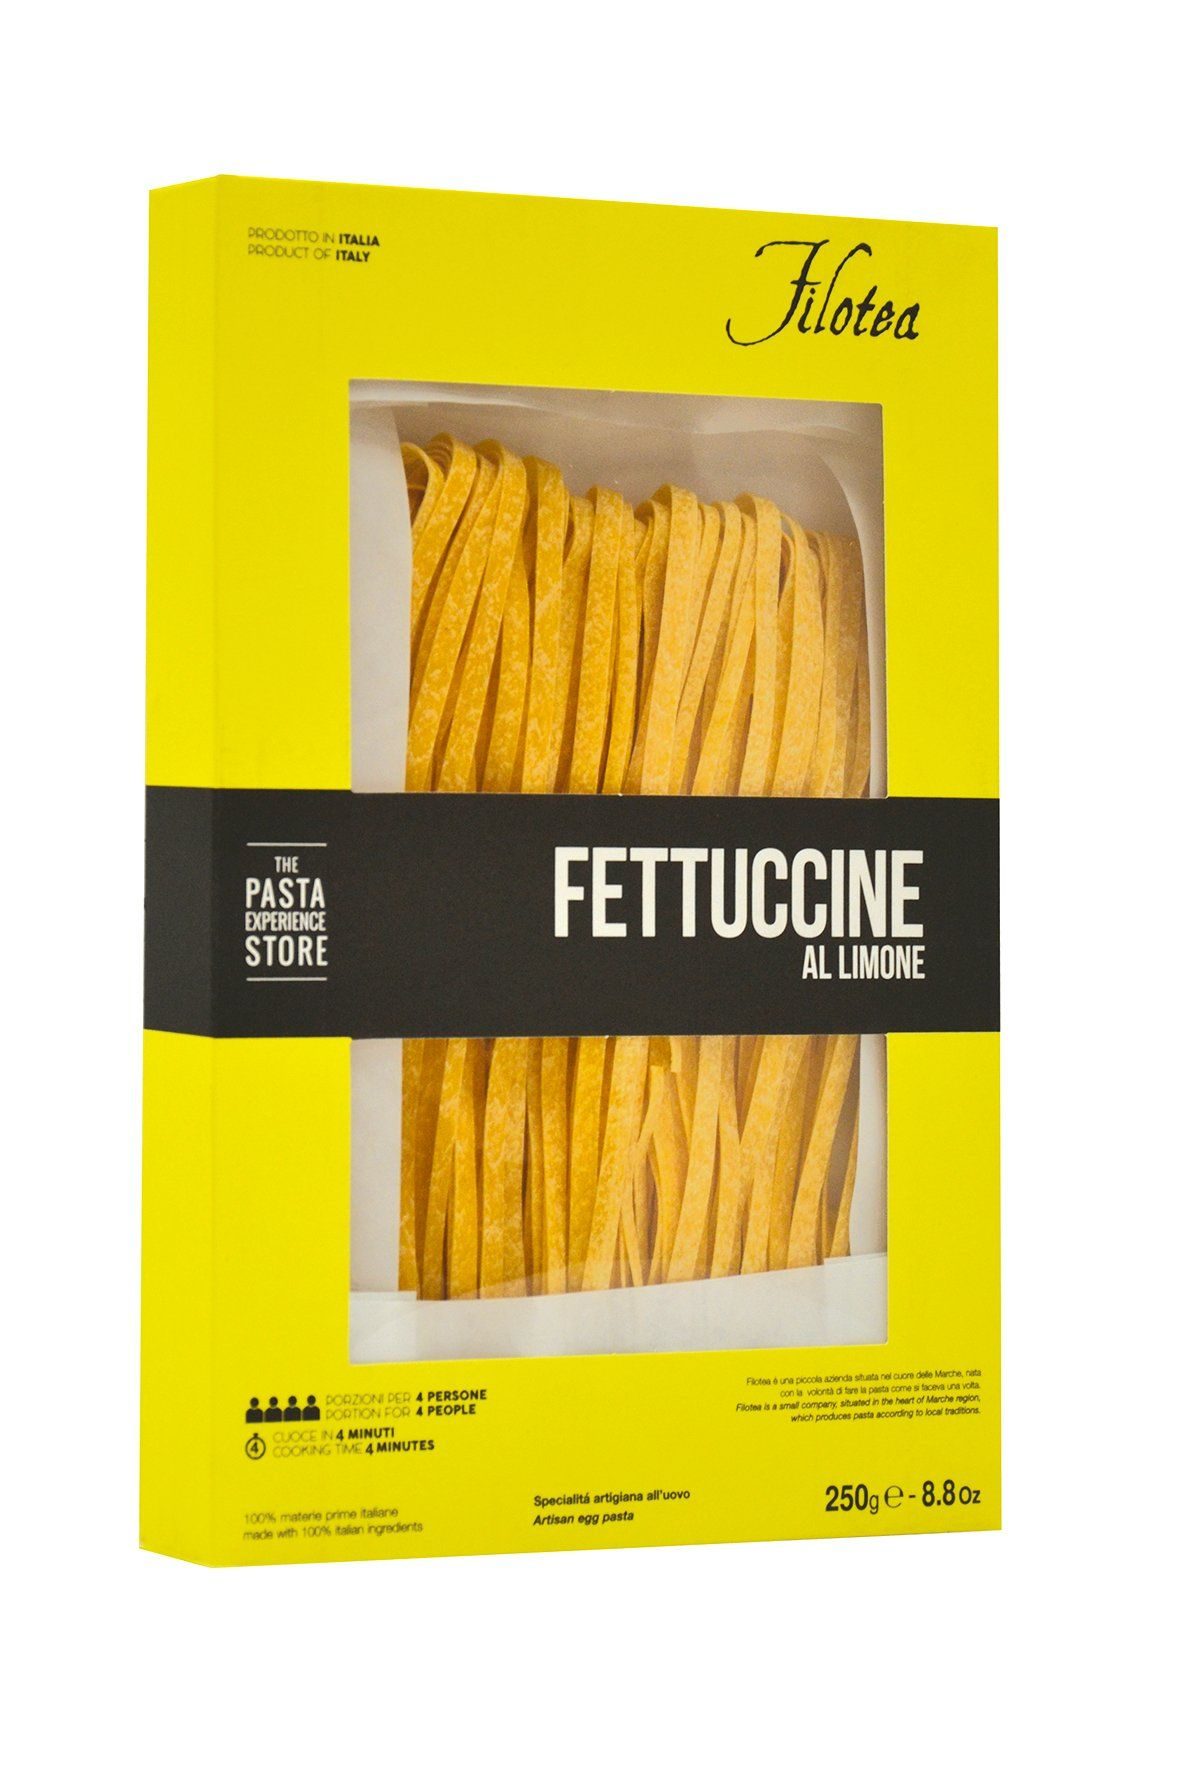 Filotea Lemon Fettuccine